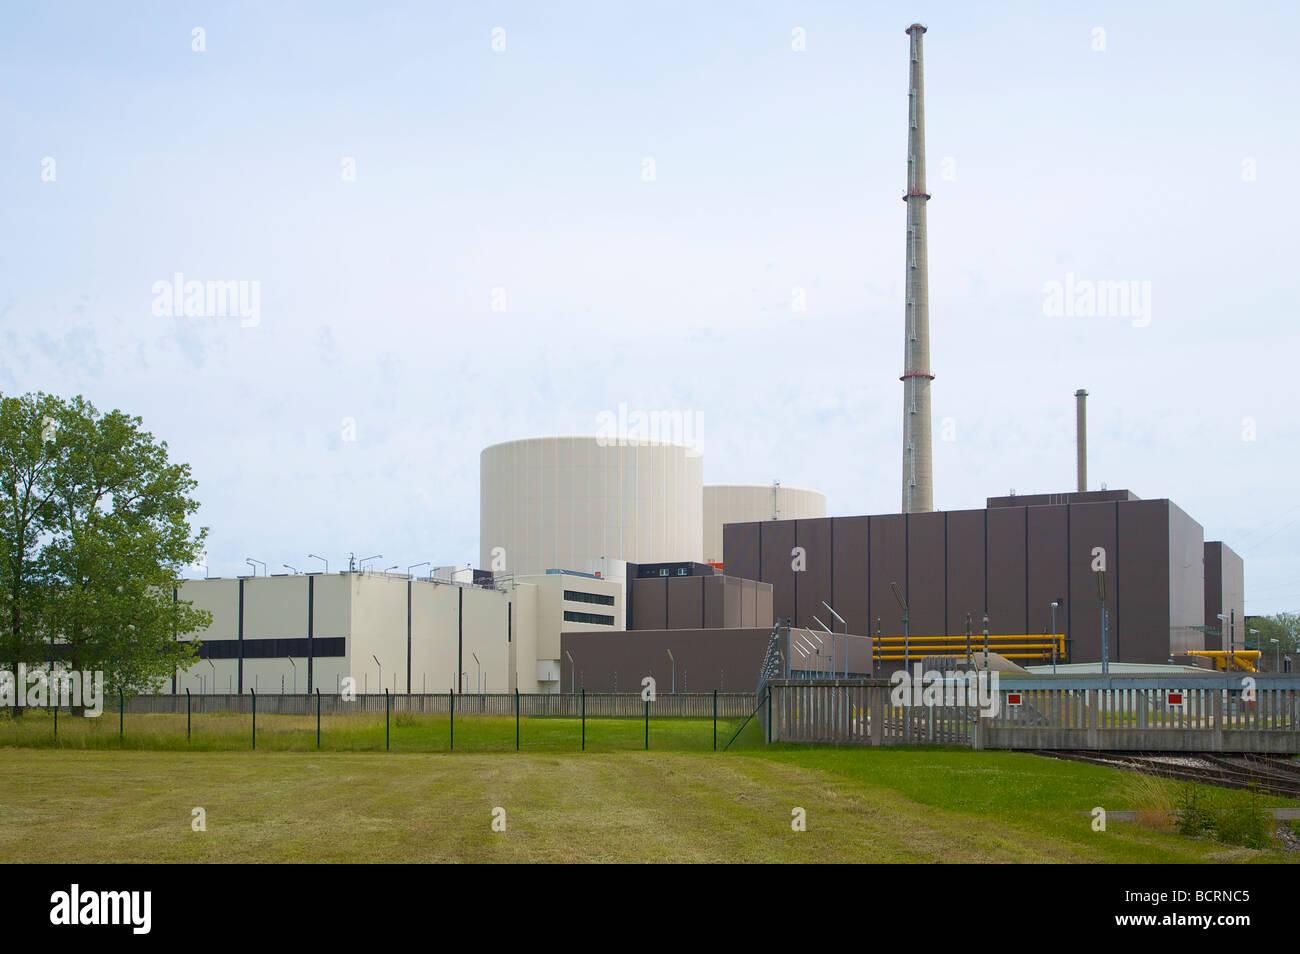 Gundremmingen nuclear power plant in Bavaria Germany 2 active BWR reactors Kernkraftwerk Gundremmingen Bayern Deutschland - Stock Image